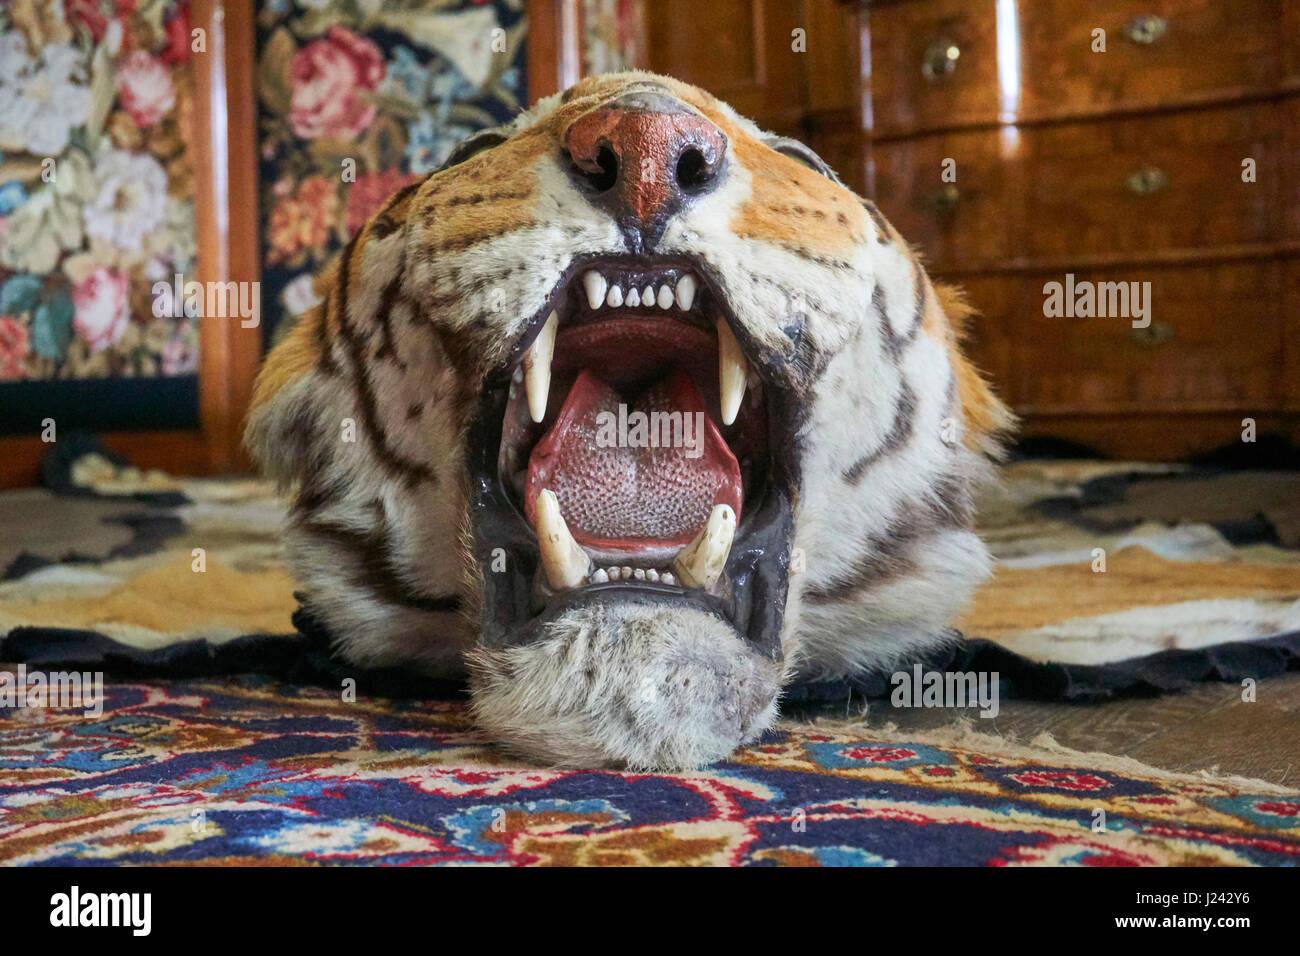 Tiger skin rug - Stock Image